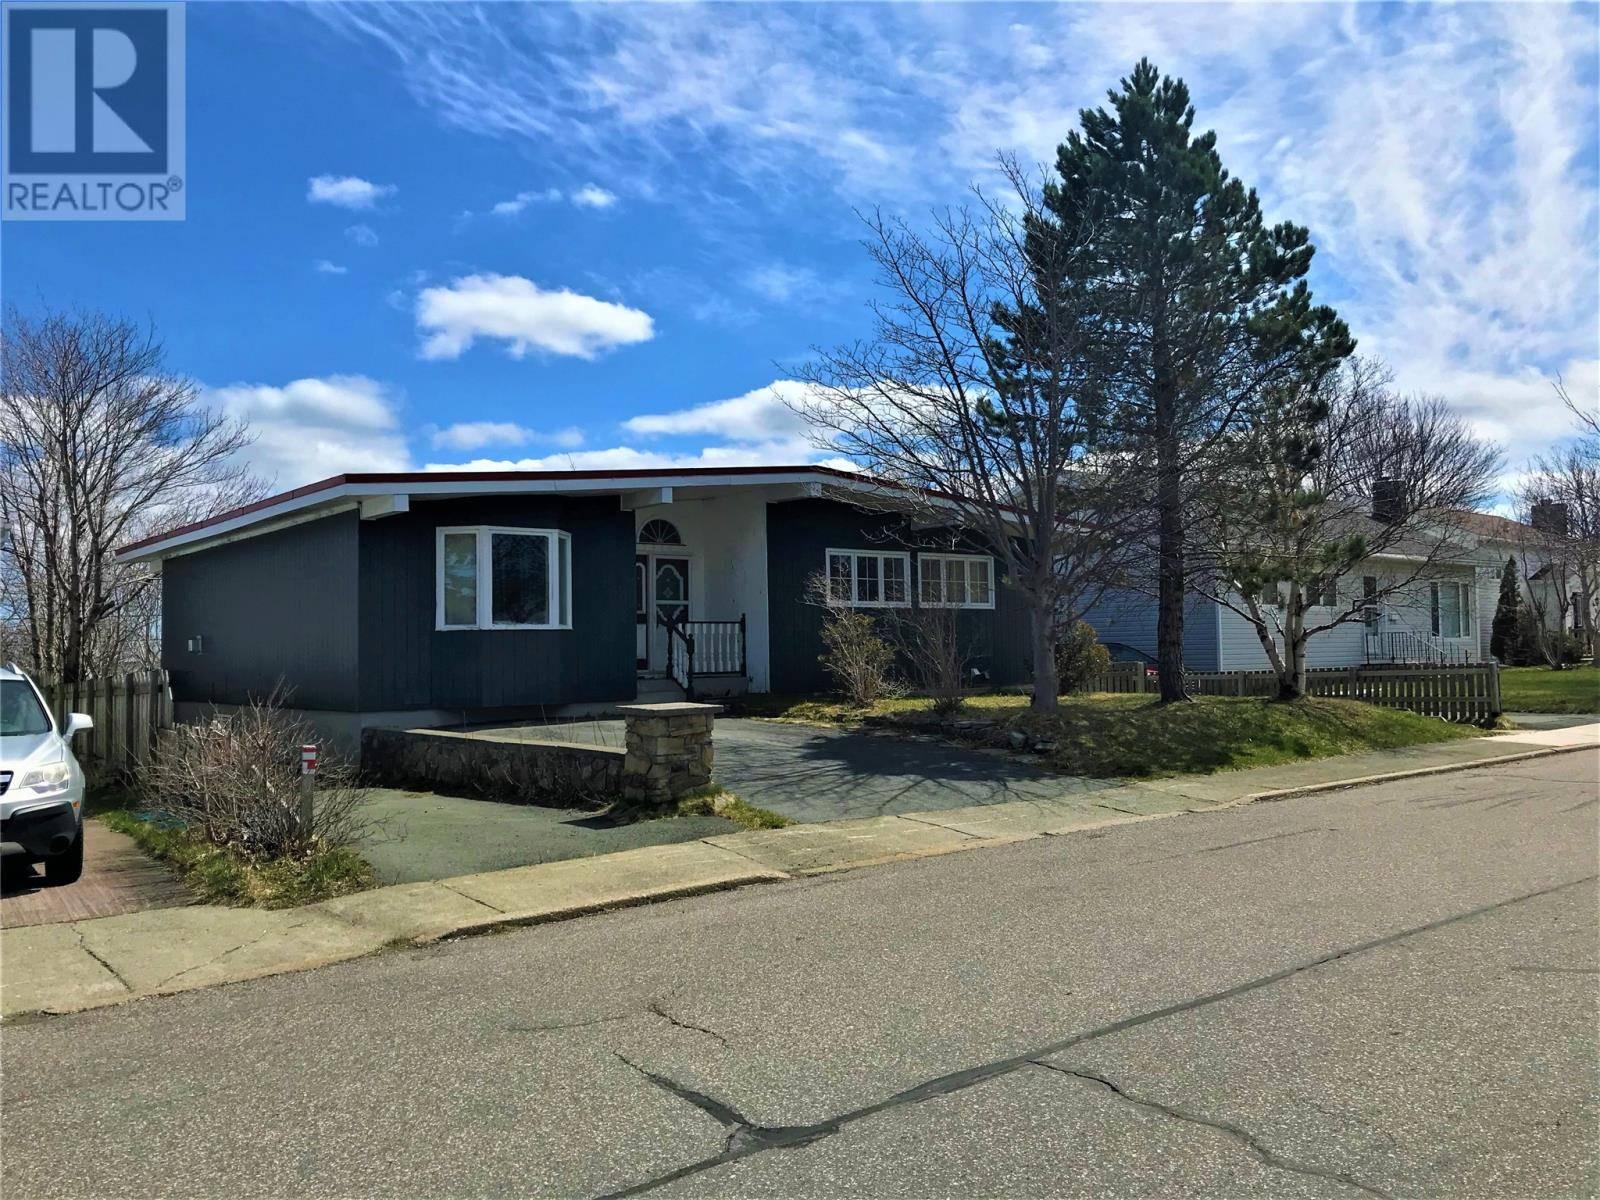 House for sale at 24 Birchwynd St St. John's Newfoundland - MLS: 1209199